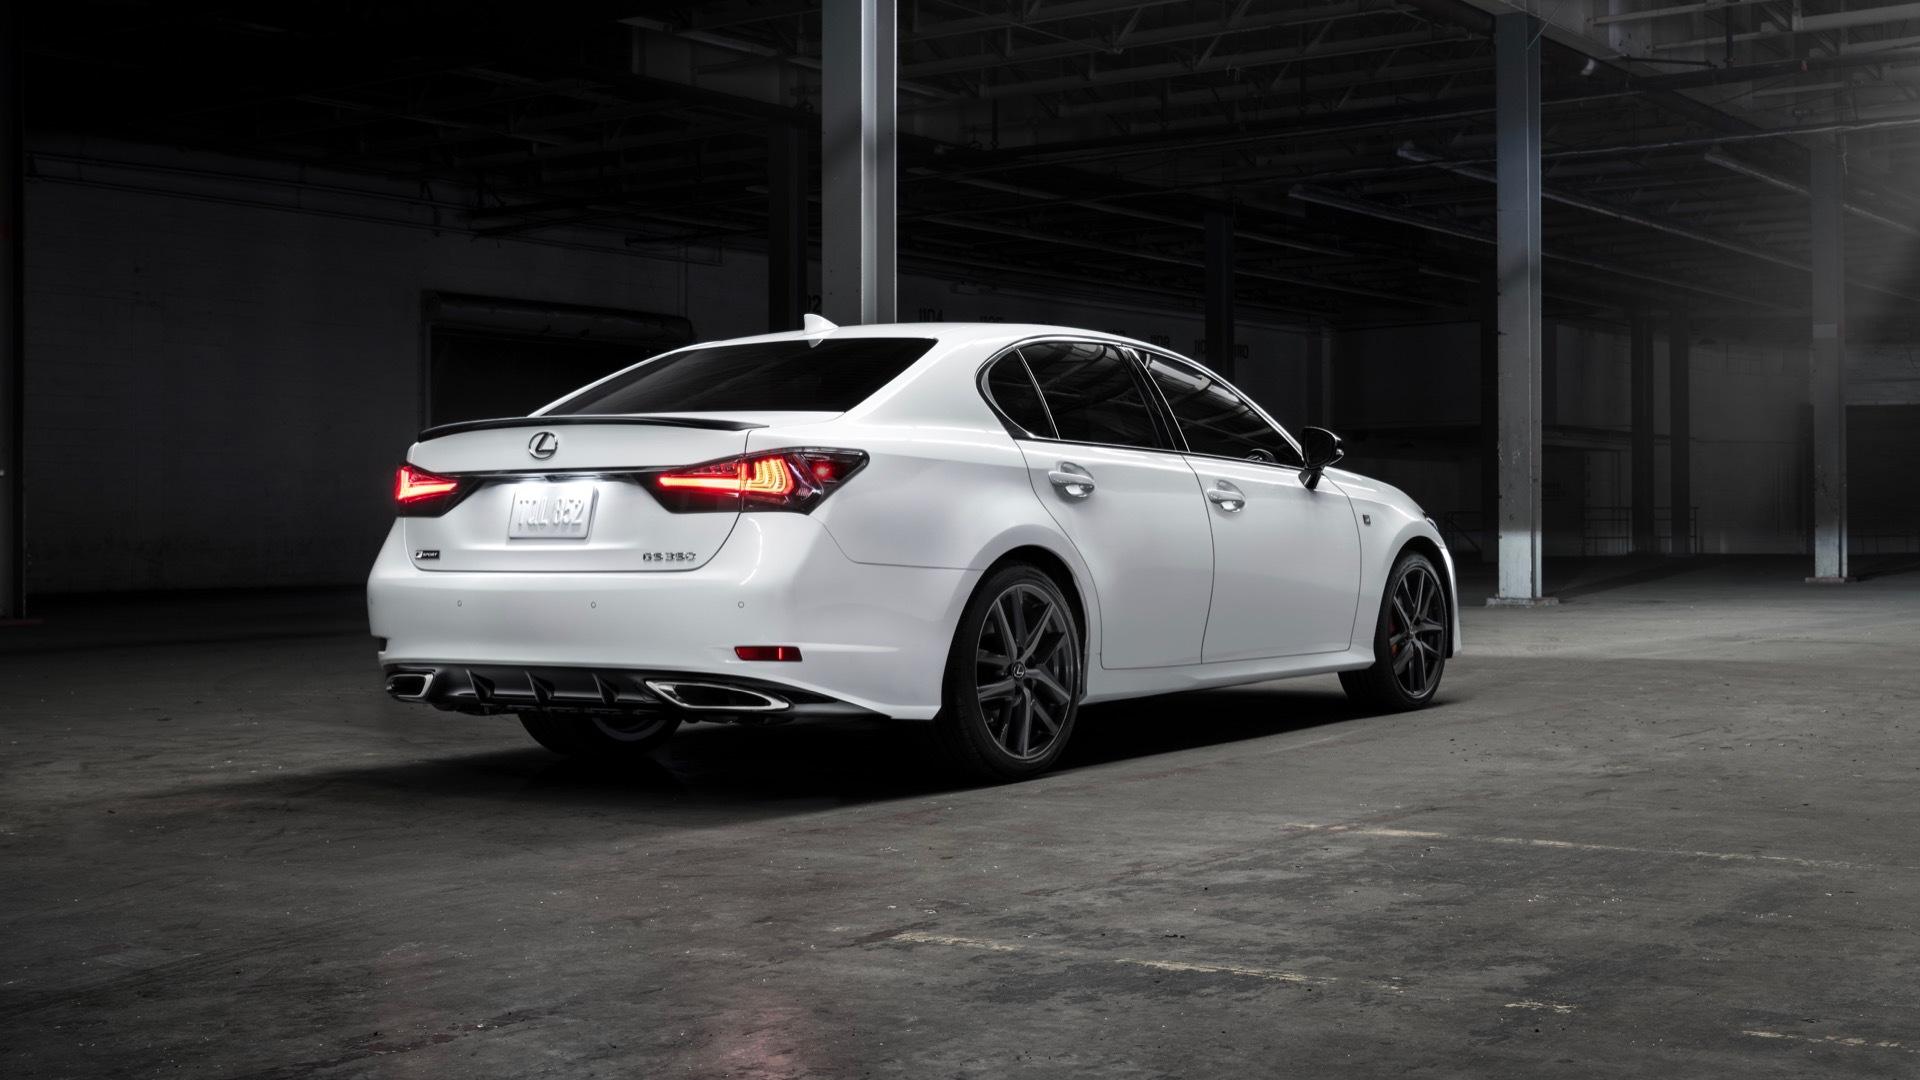 2020 Lexus GS Black Line special edition